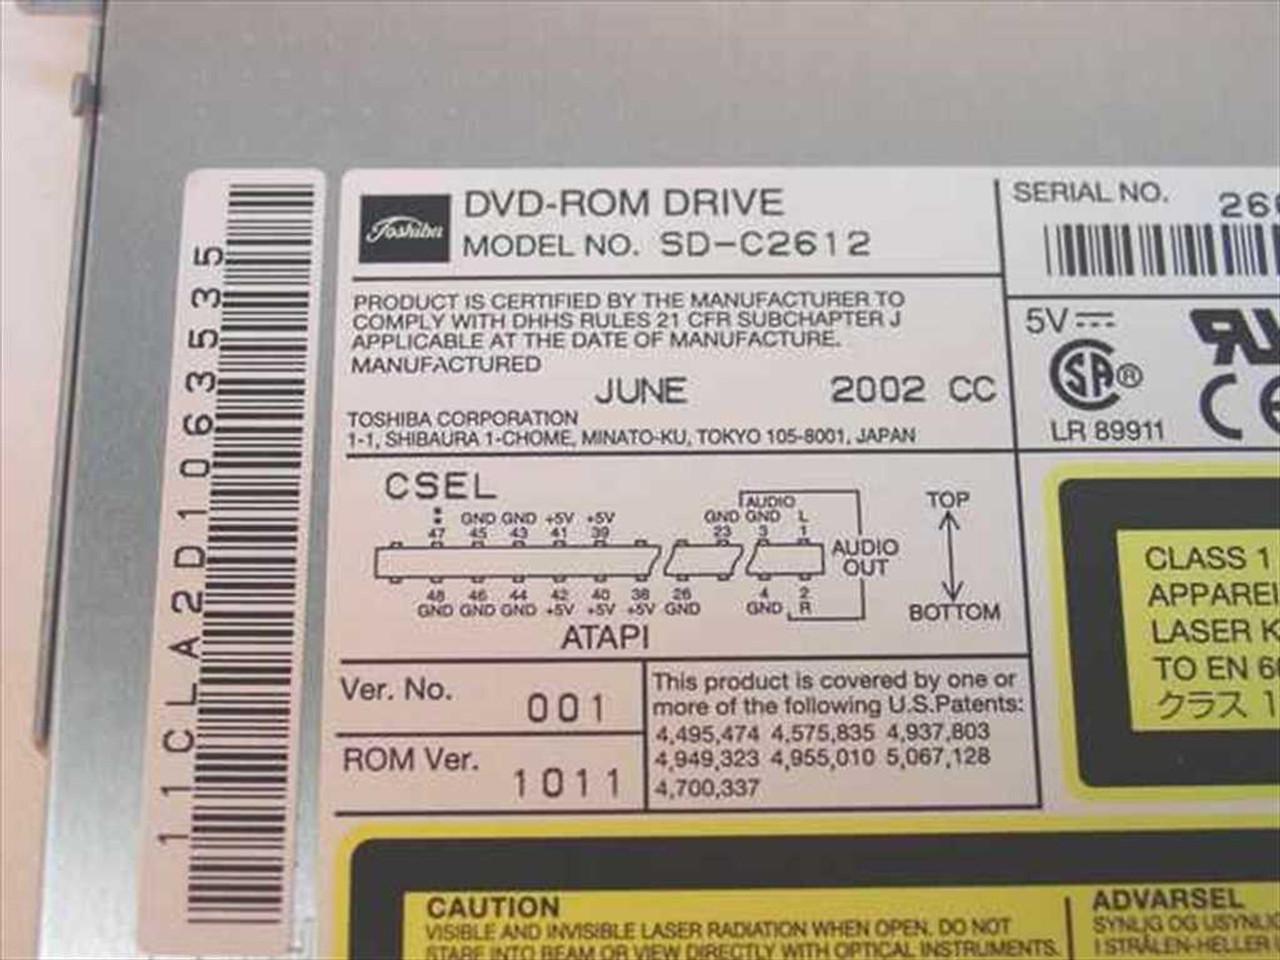 Driver toshiba dvd-rom sd-c2612.